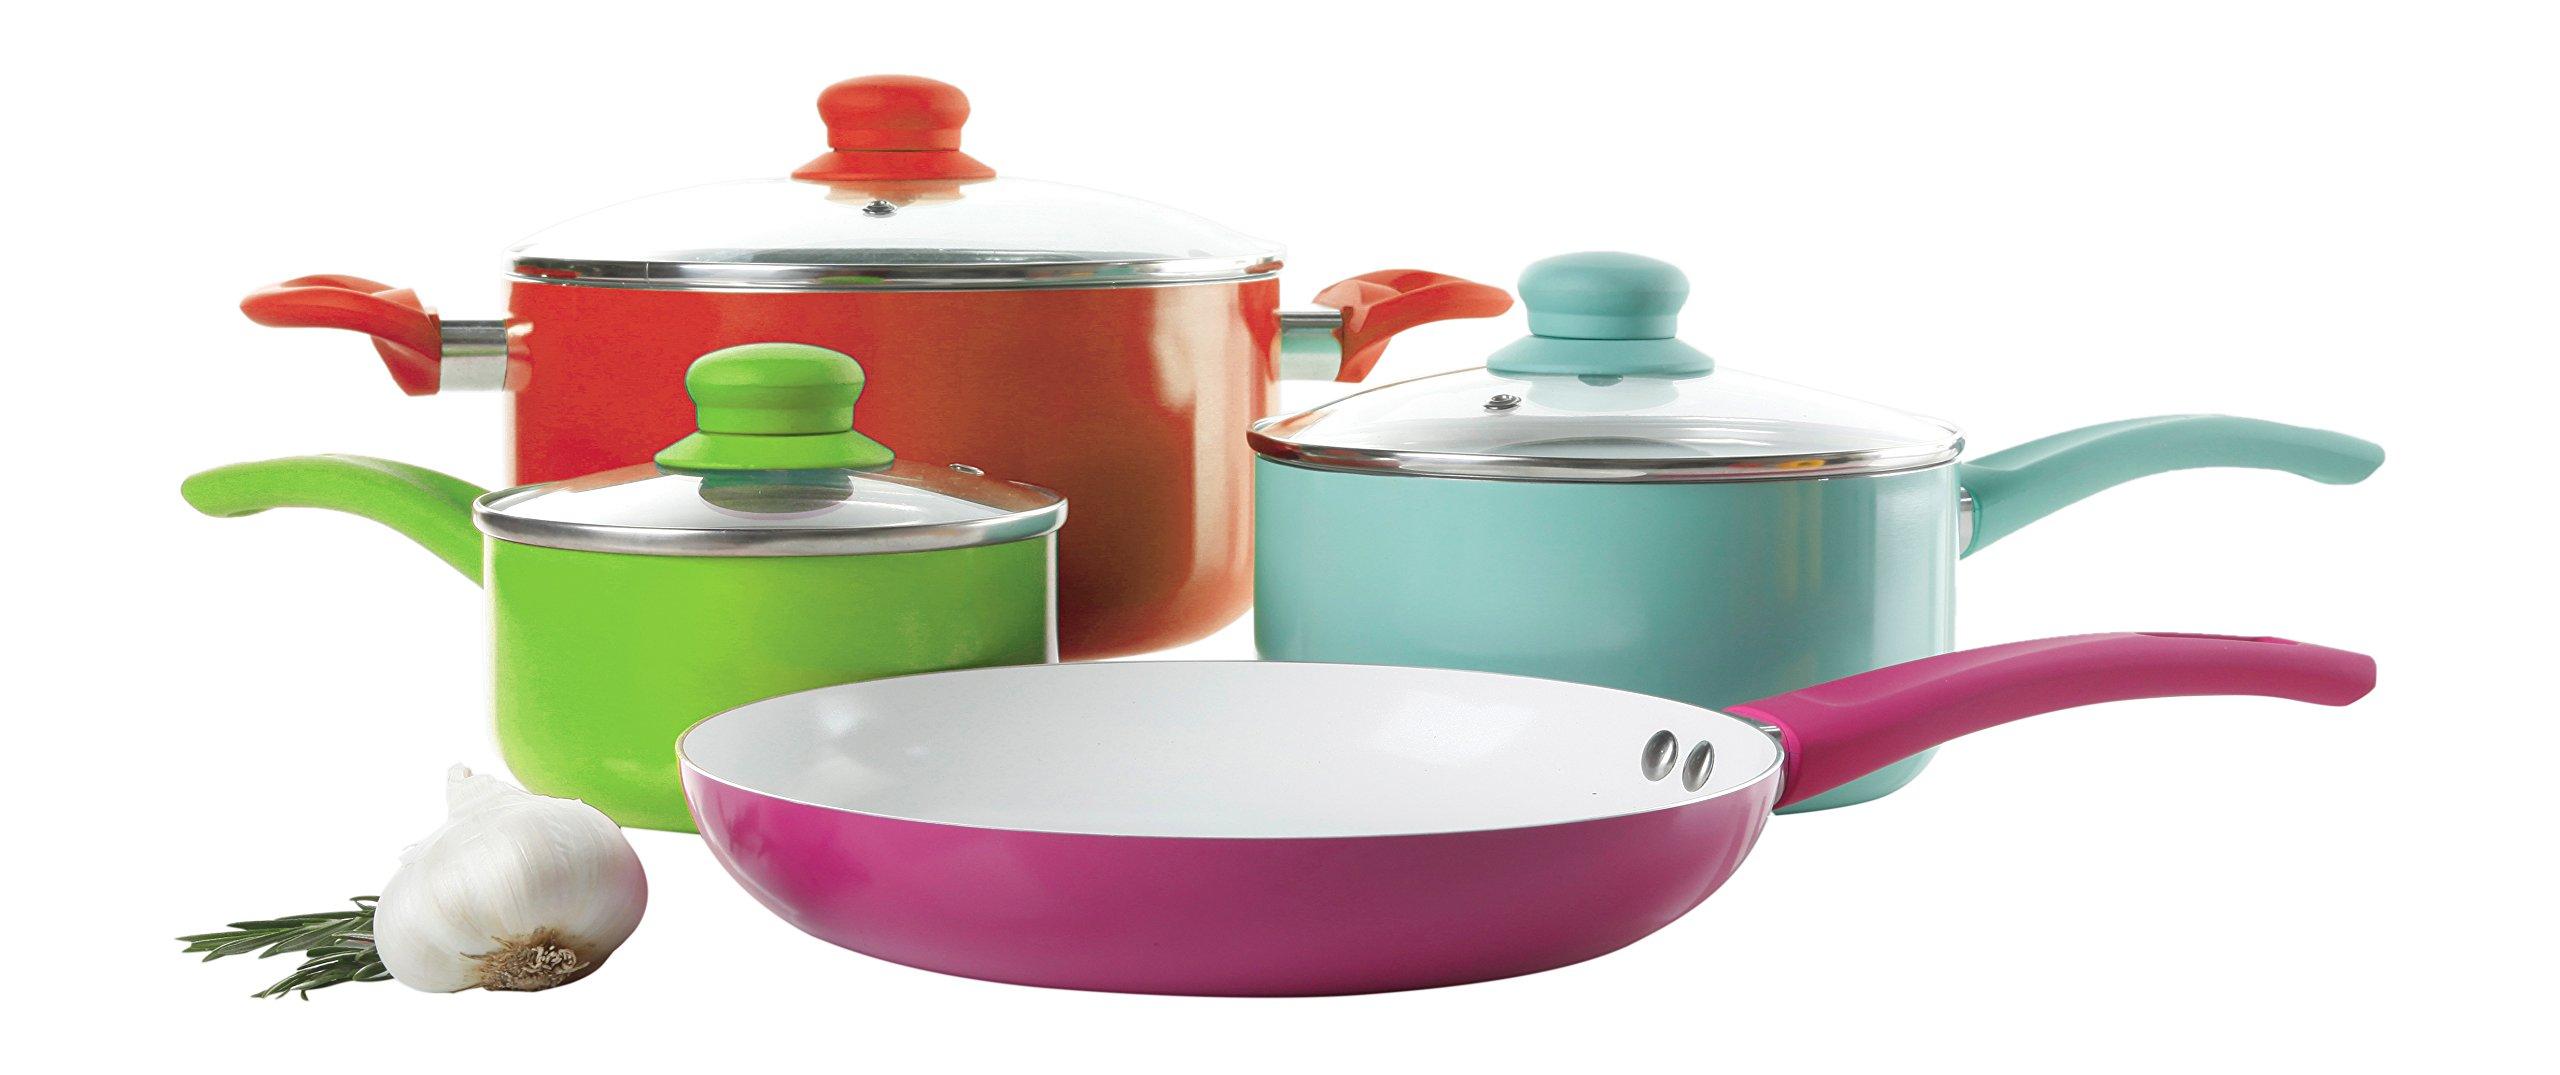 Gibson Home 108152.07 Benni 7 Piece Assorted Aluminum Cookware Set, Multicolored